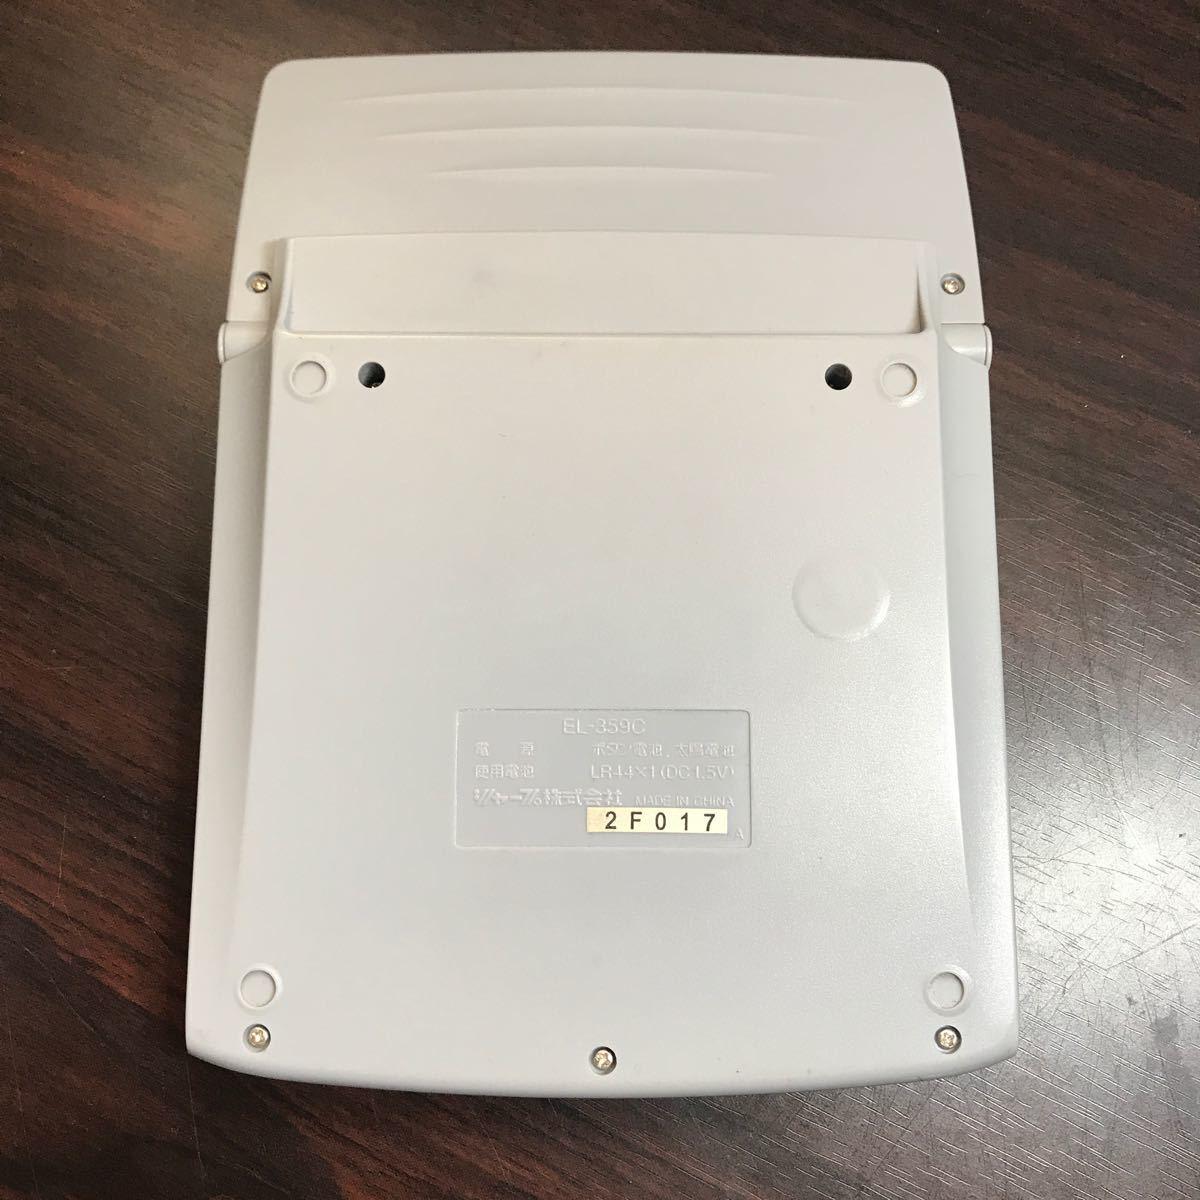 SHARP シャープ EL-359C 電卓  計算機